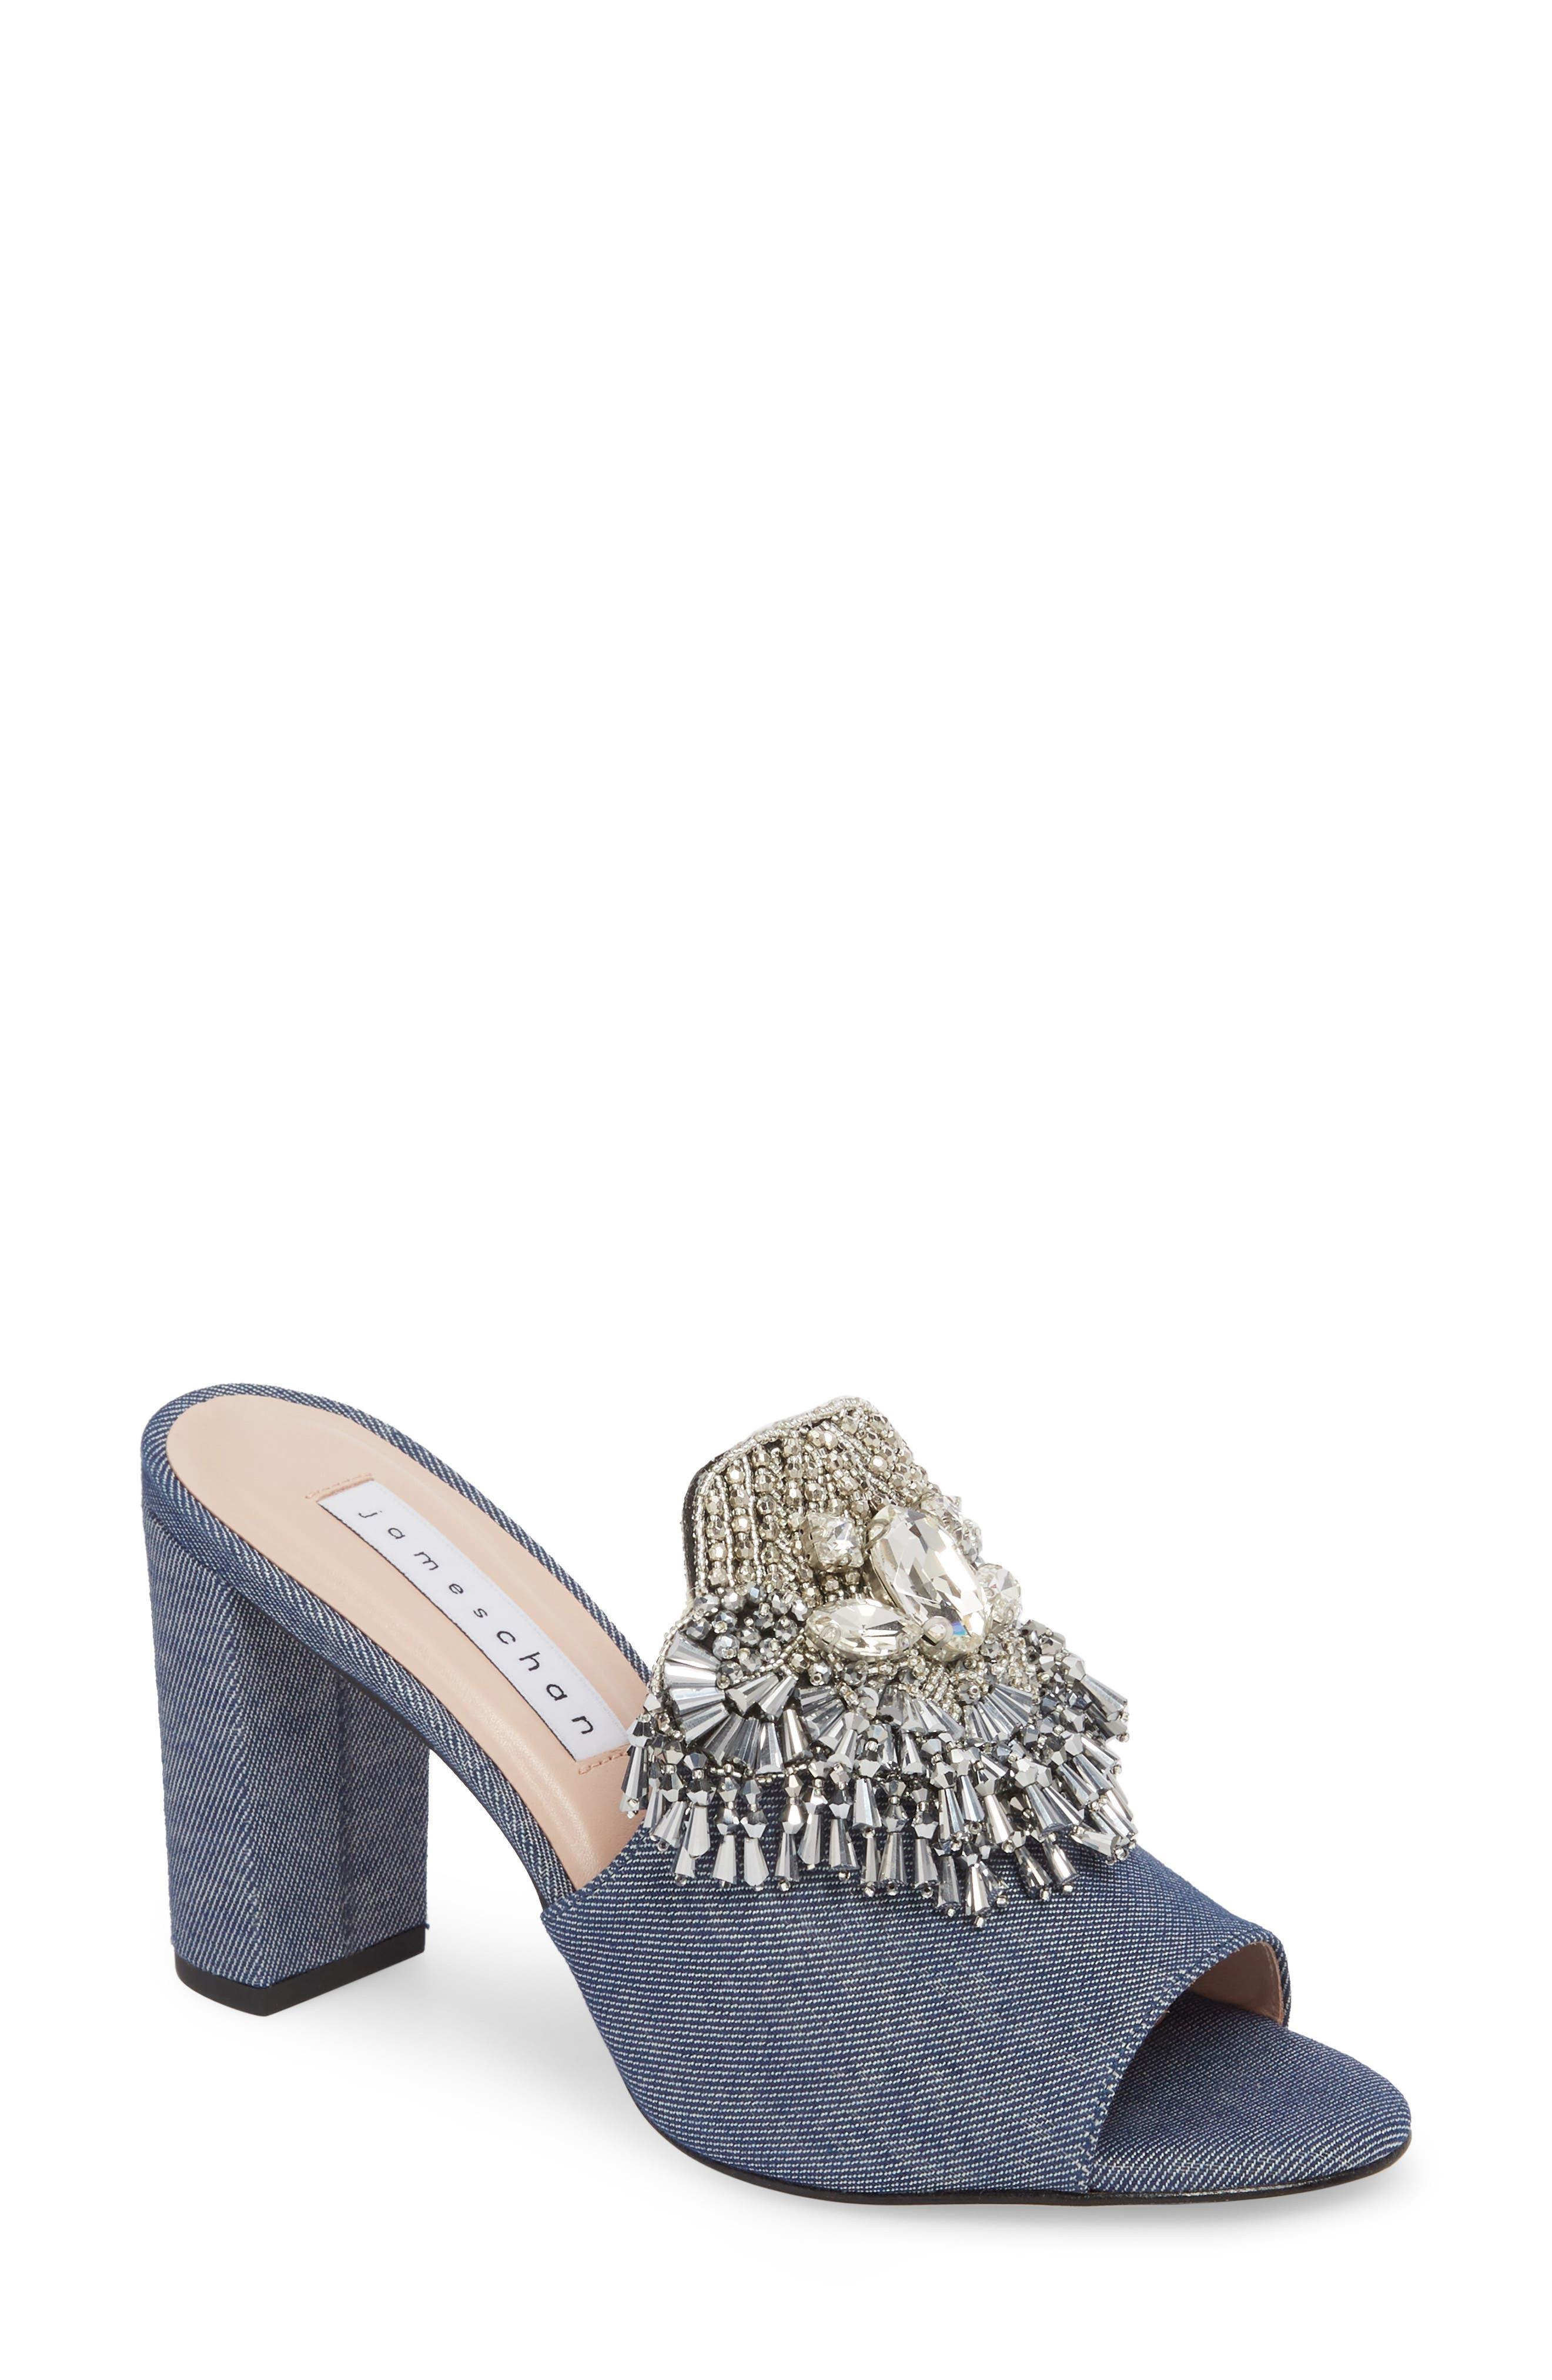 Adele Embellished Block Heel Sandal,                             Main thumbnail 1, color,                             Denim Patent